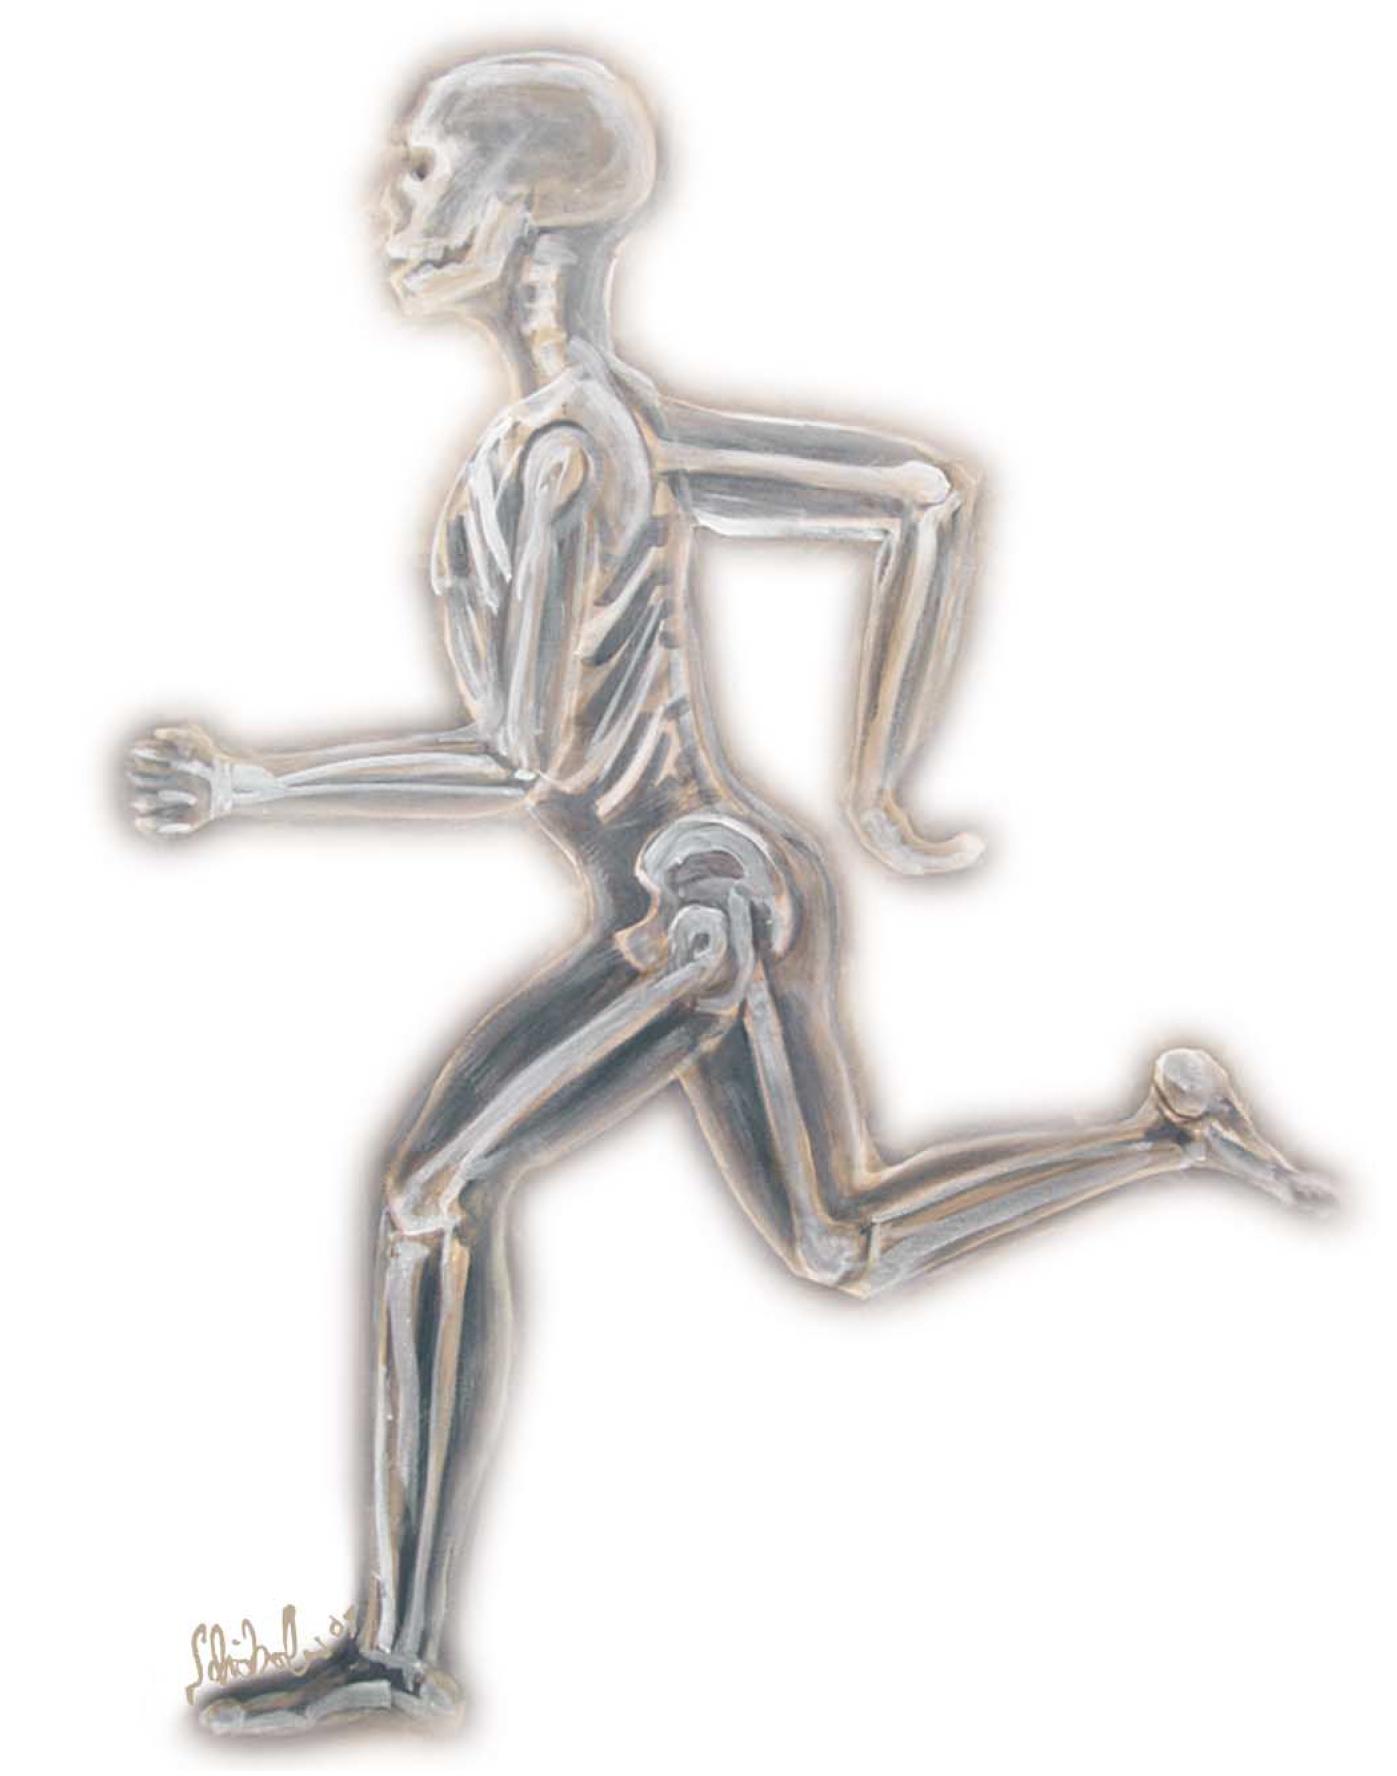 Startklar für den Röntgenlauf